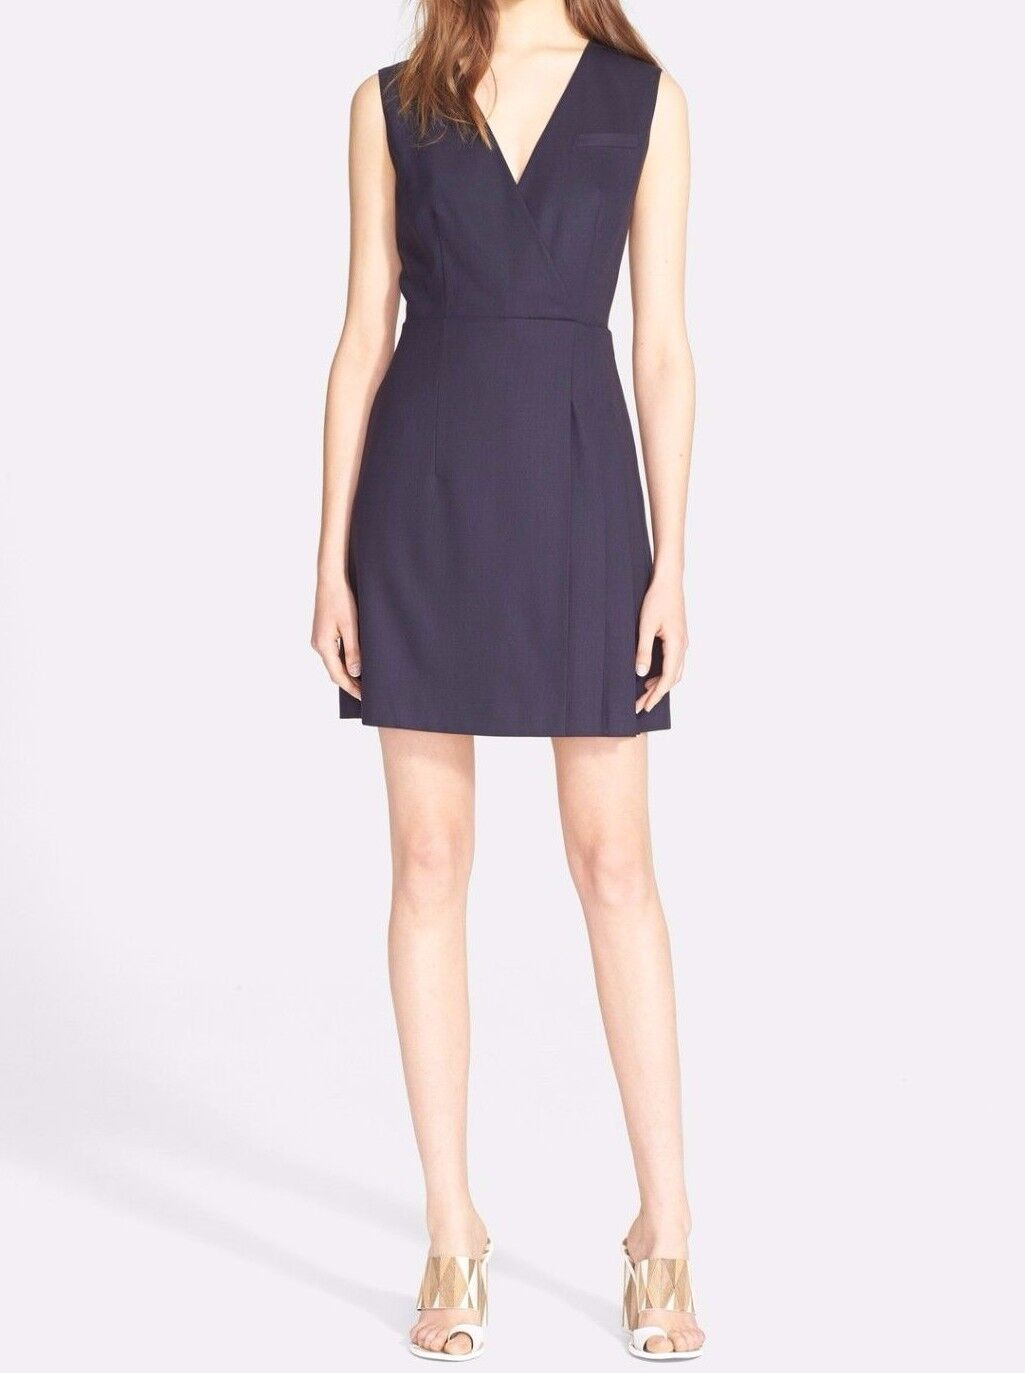 Women's Tory Burch size 14 Navy bluee Wool A-Line Sleeveless Stretch Dress NWT